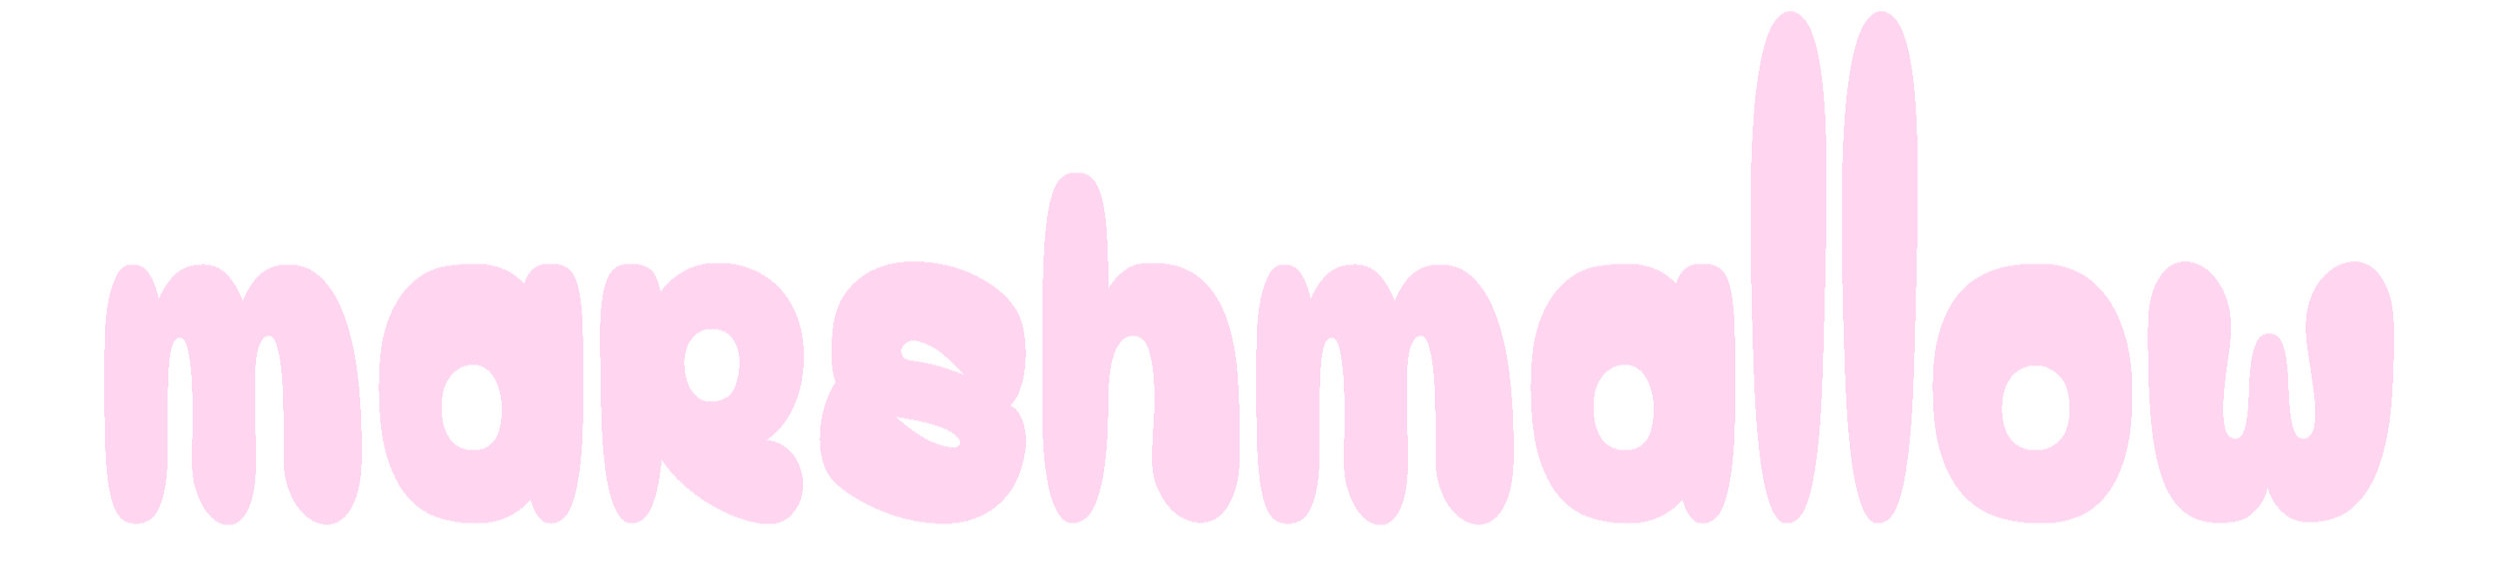 marshmallow logo_4.jpg